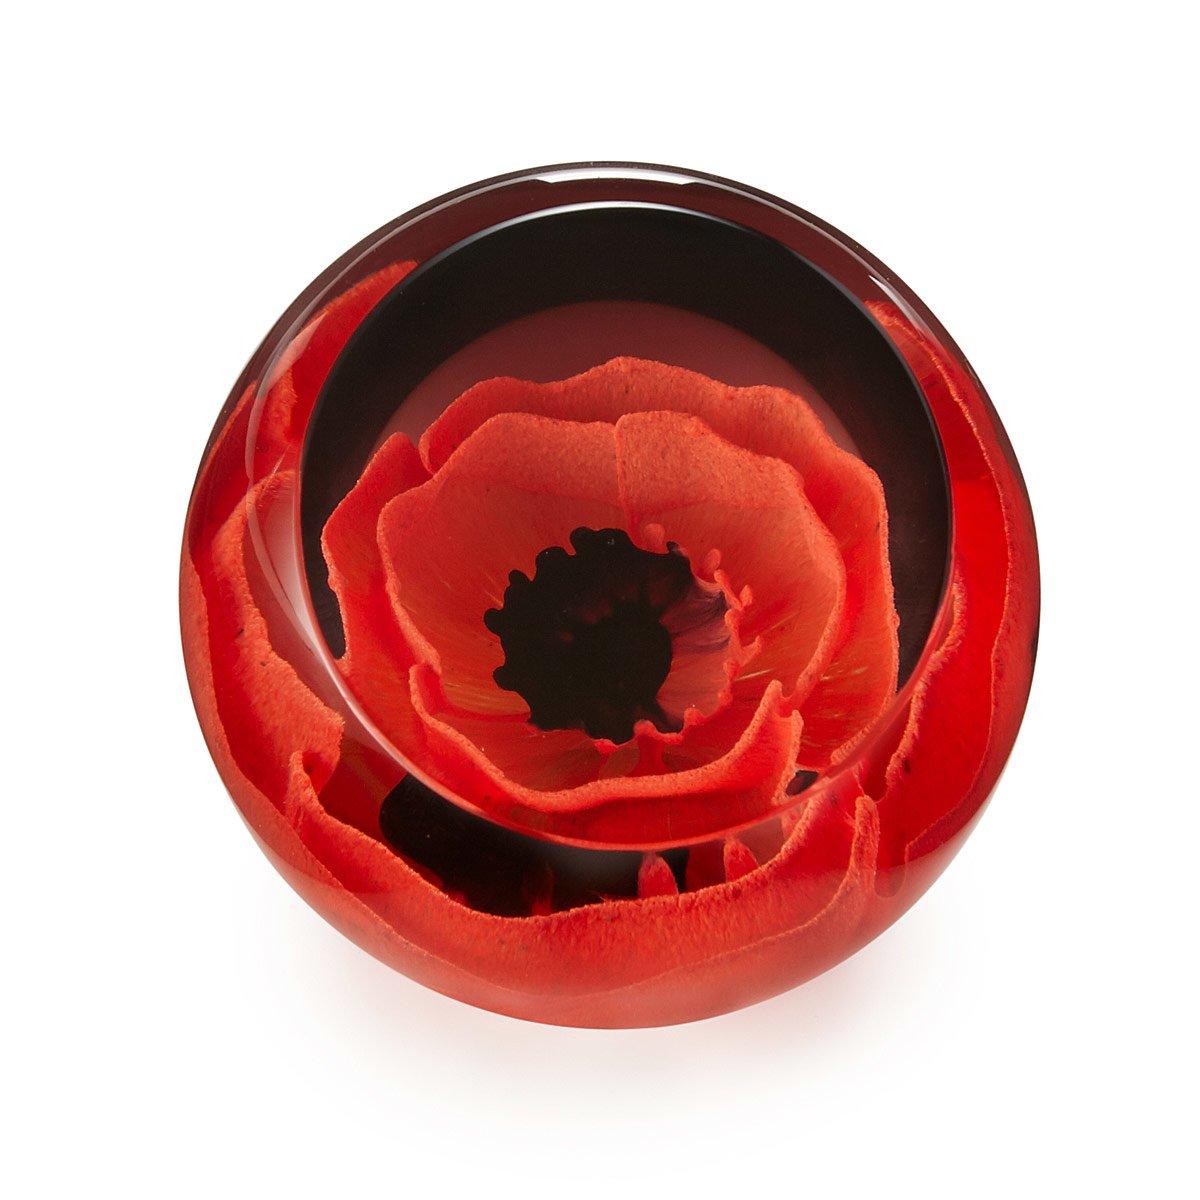 Poppy Paperweight Glass Flowers World War 1 Uncommongoods